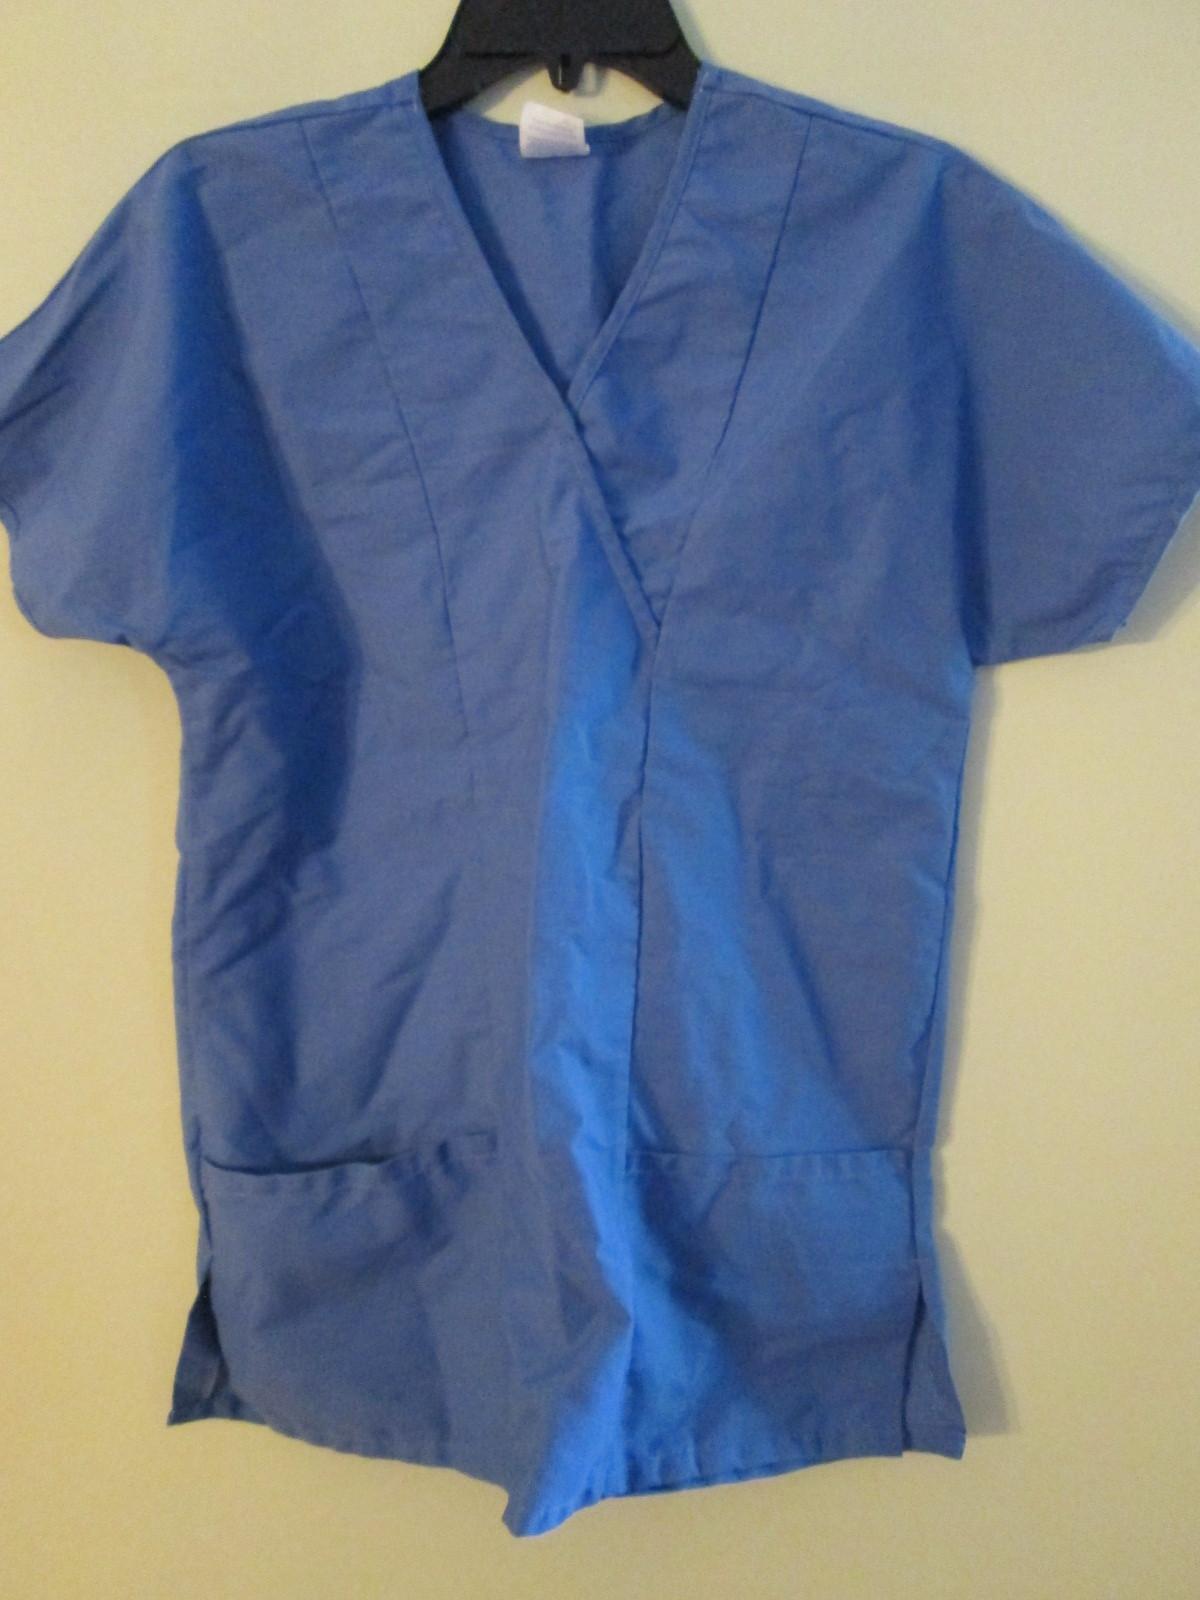 Blue scrubs top size XS by Medline jch090